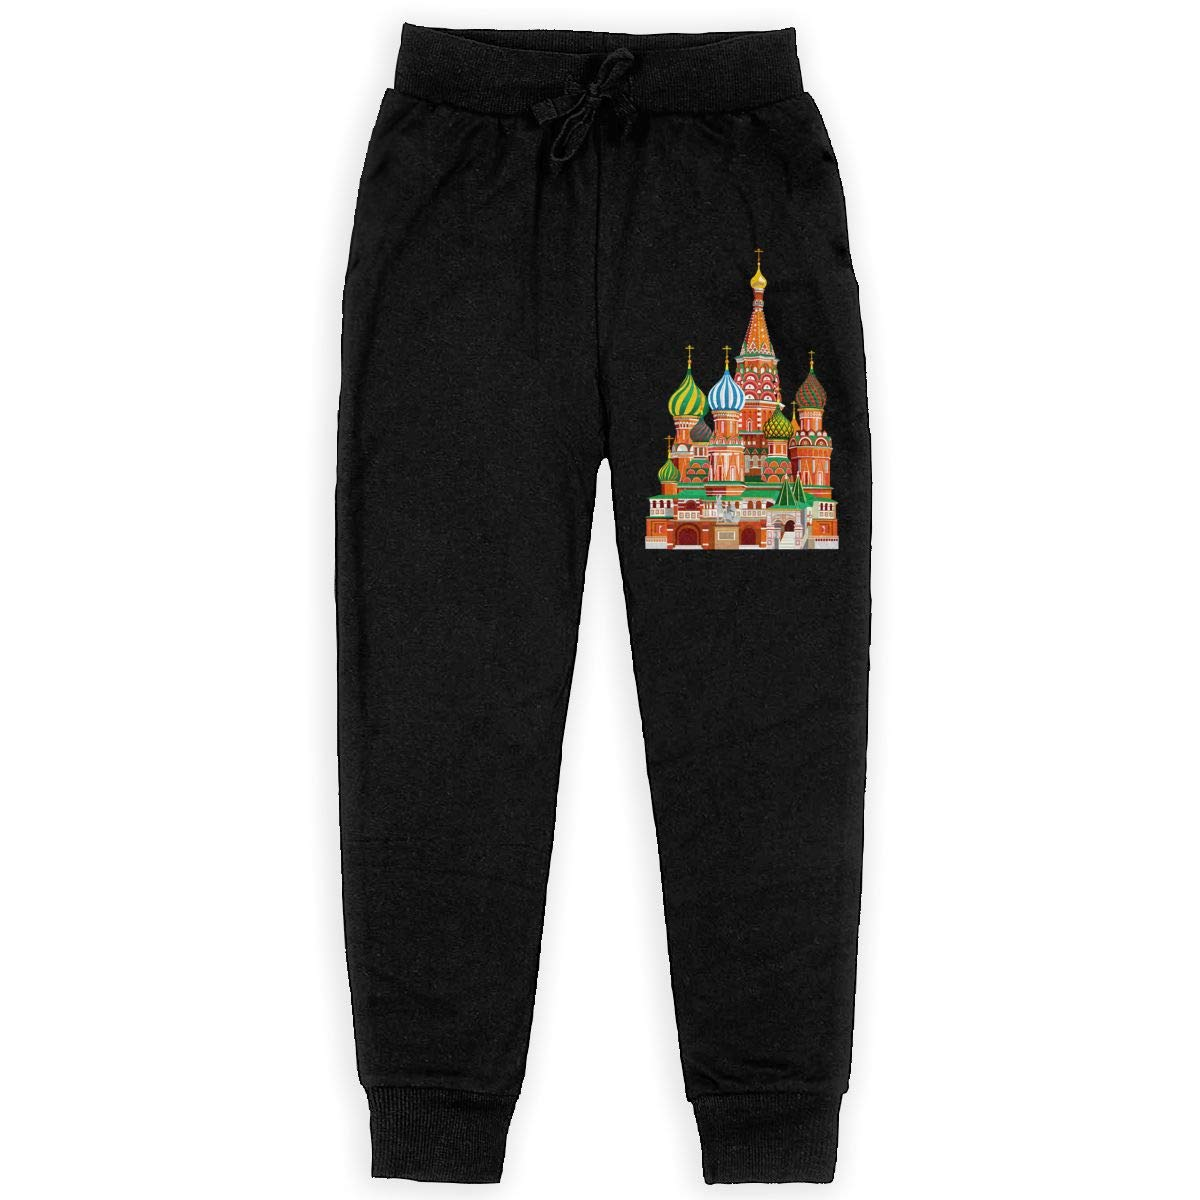 Qinf Boys Sweatpants Color Russian Architecture Joggers Sport Training Pants Trousers Black